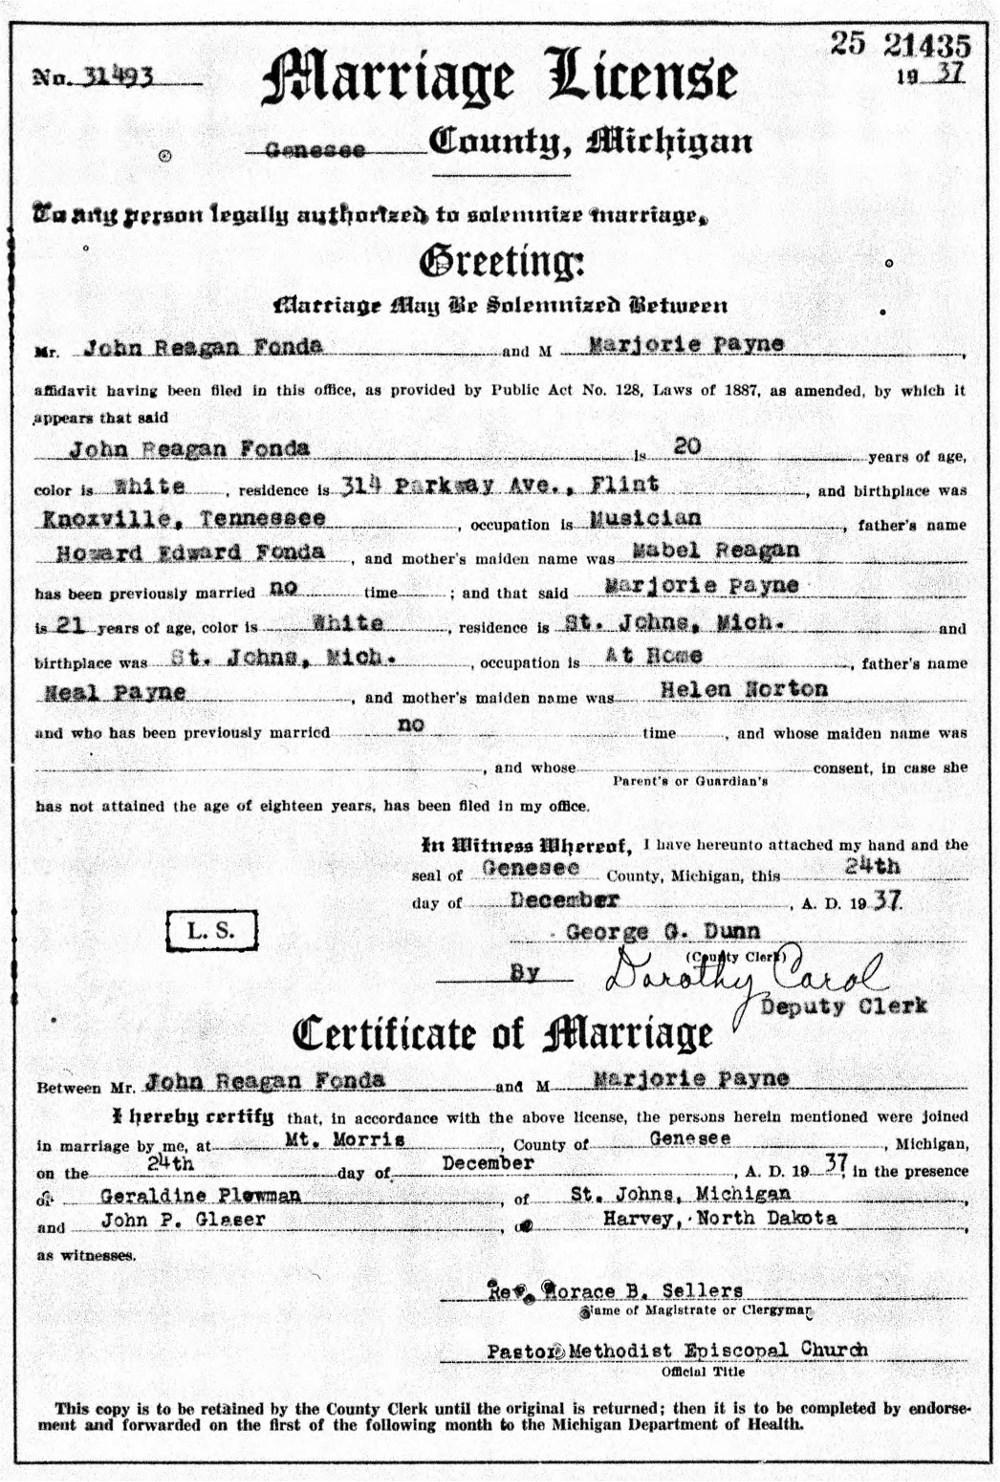 michigan marriage record Wedding License Genesee County Mi Wedding License Genesee County Mi #10 marriage license genesee county michigan